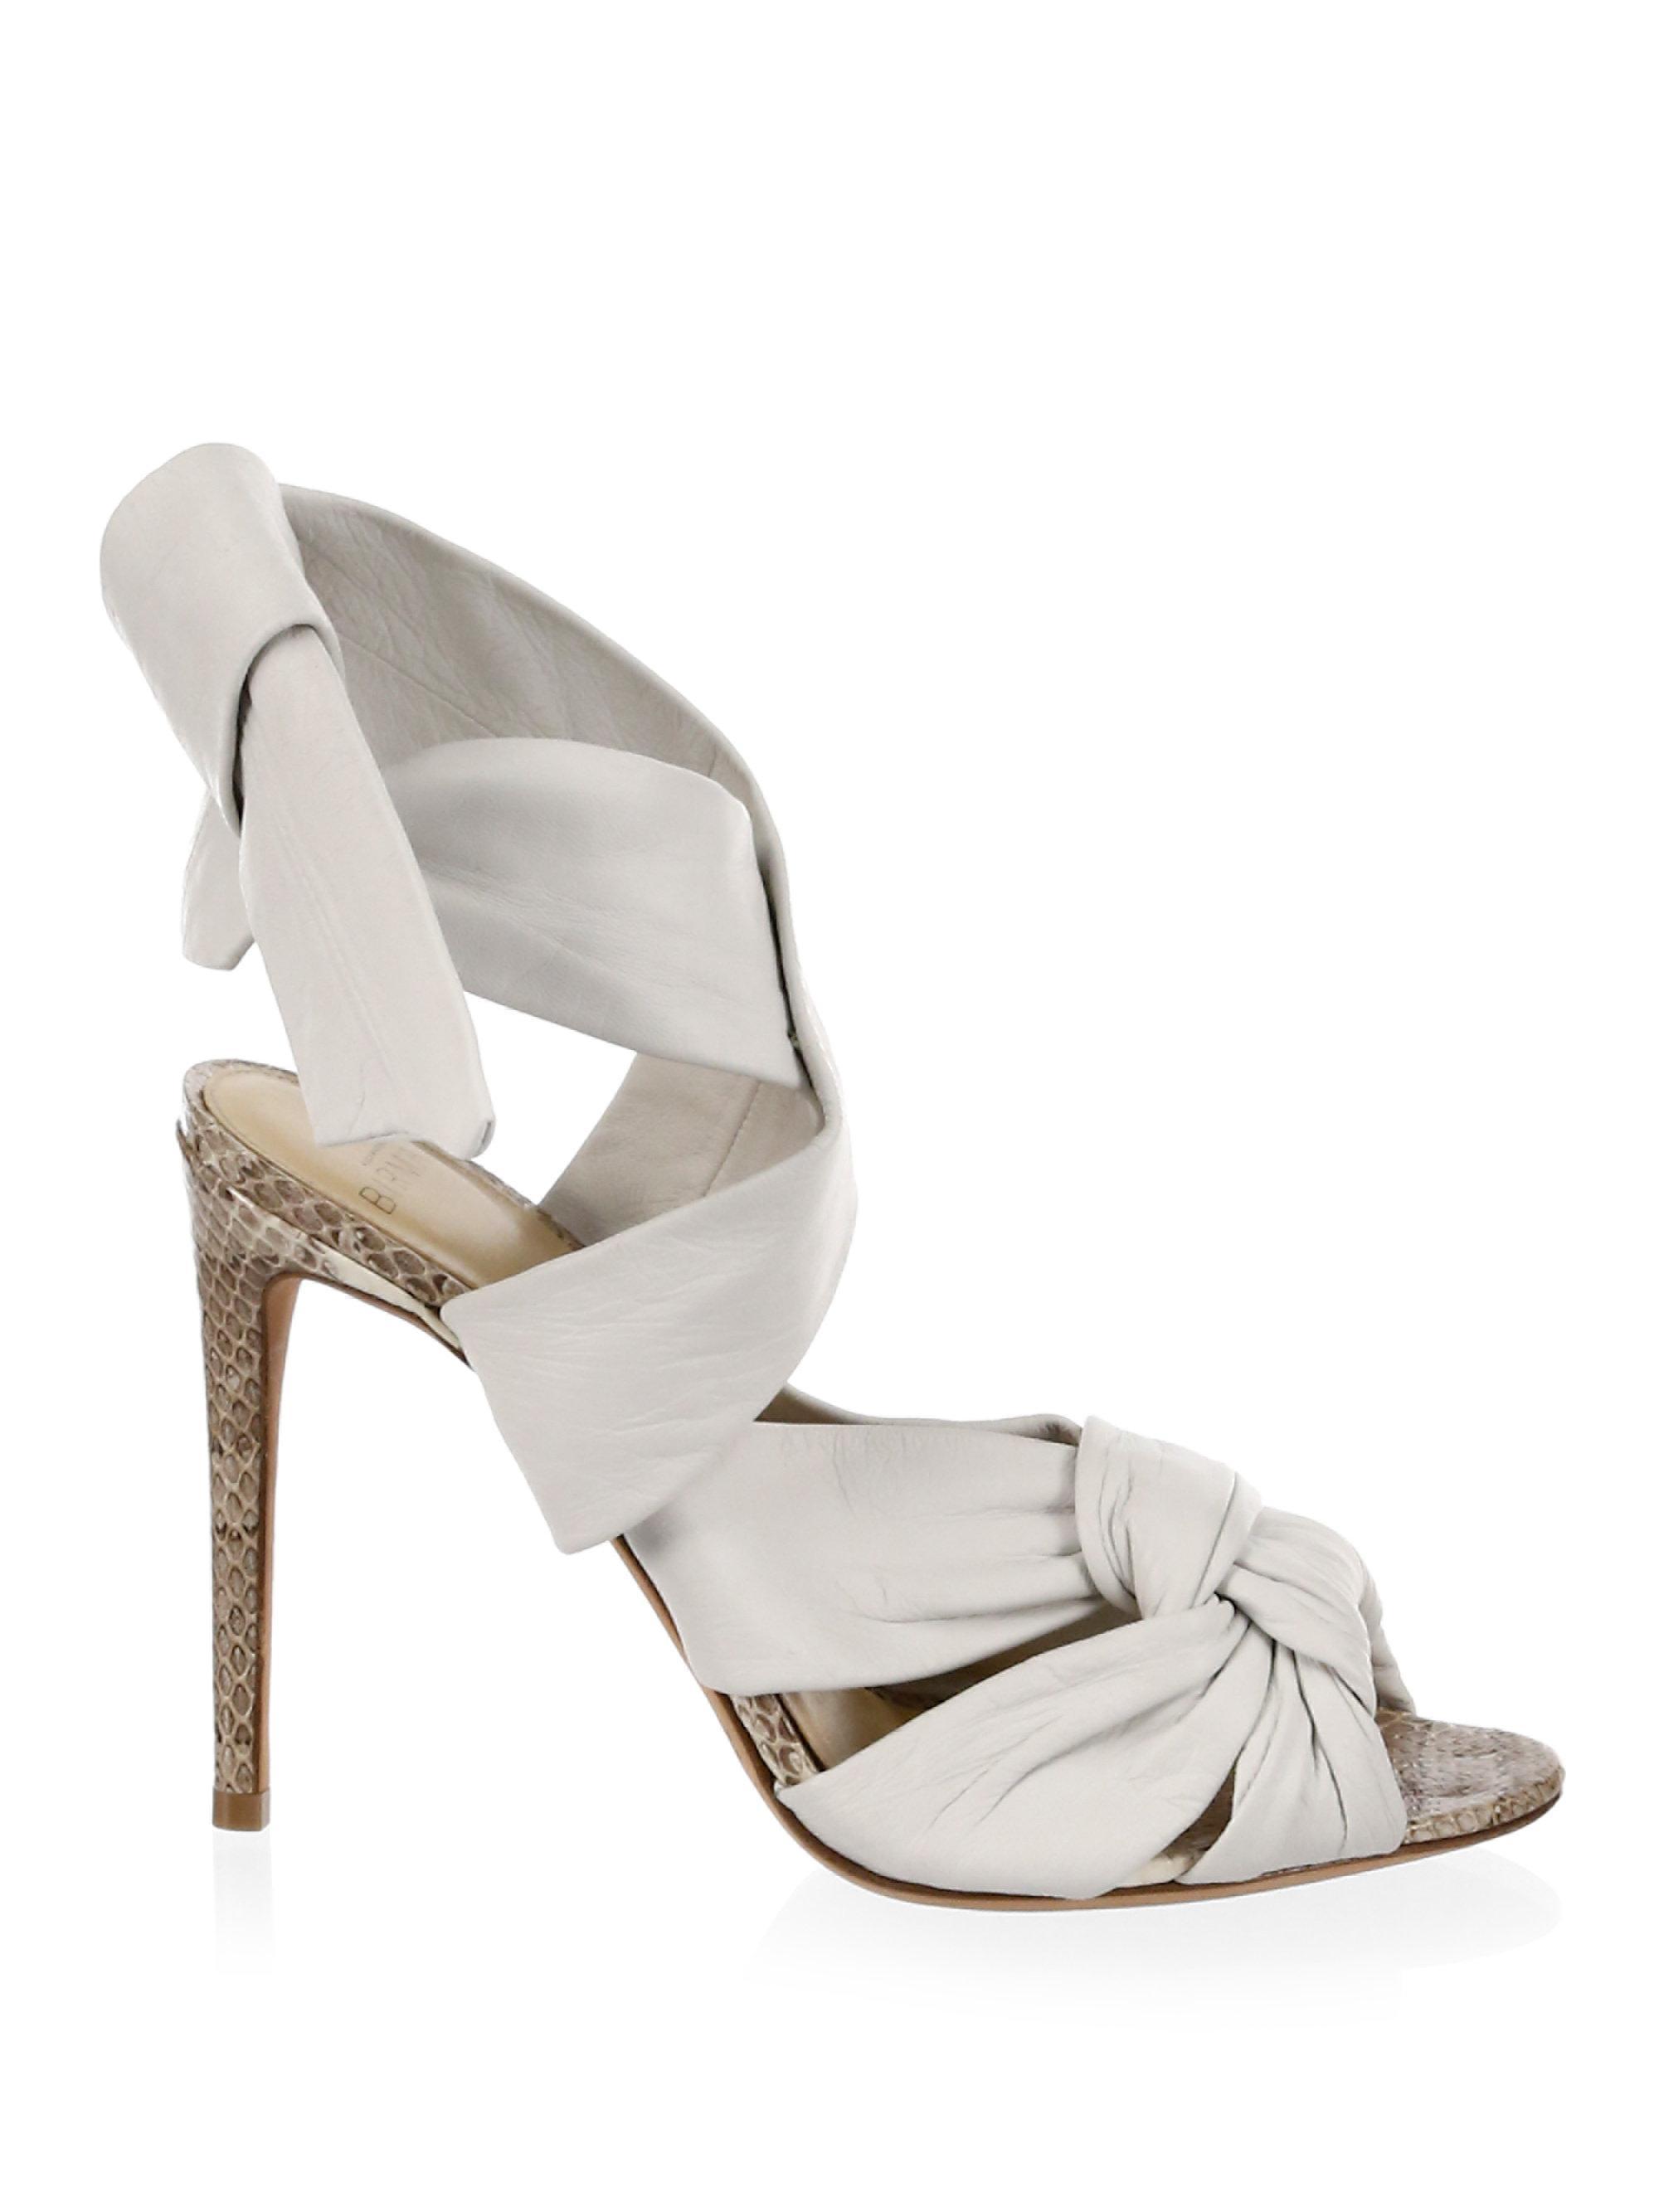 Maleah sandals - White Alexandre Birman r1jA8a9d